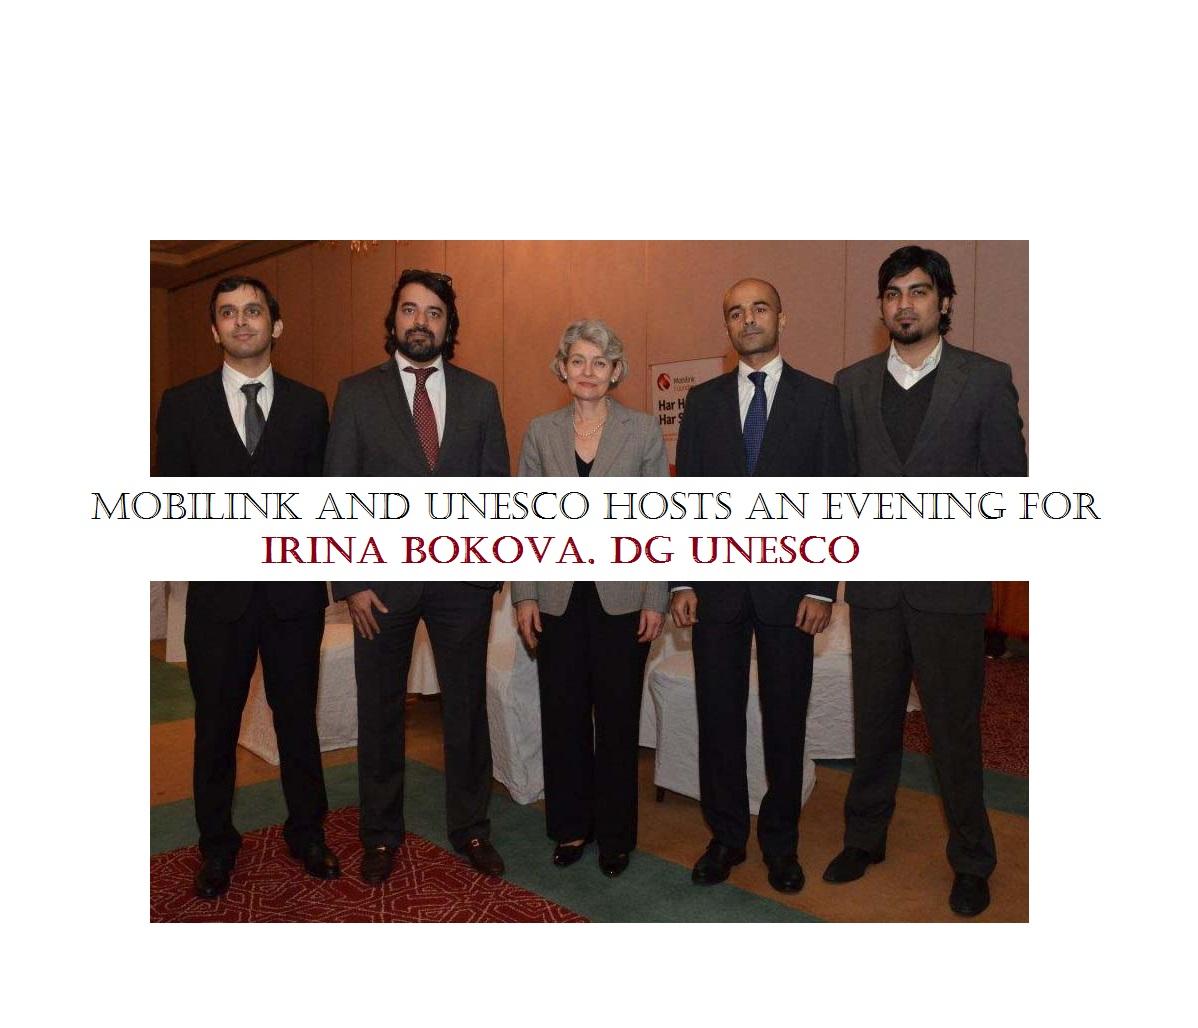 Mobilink and UNESCO hosts an evening for Irina Bokova, DG UNESCO